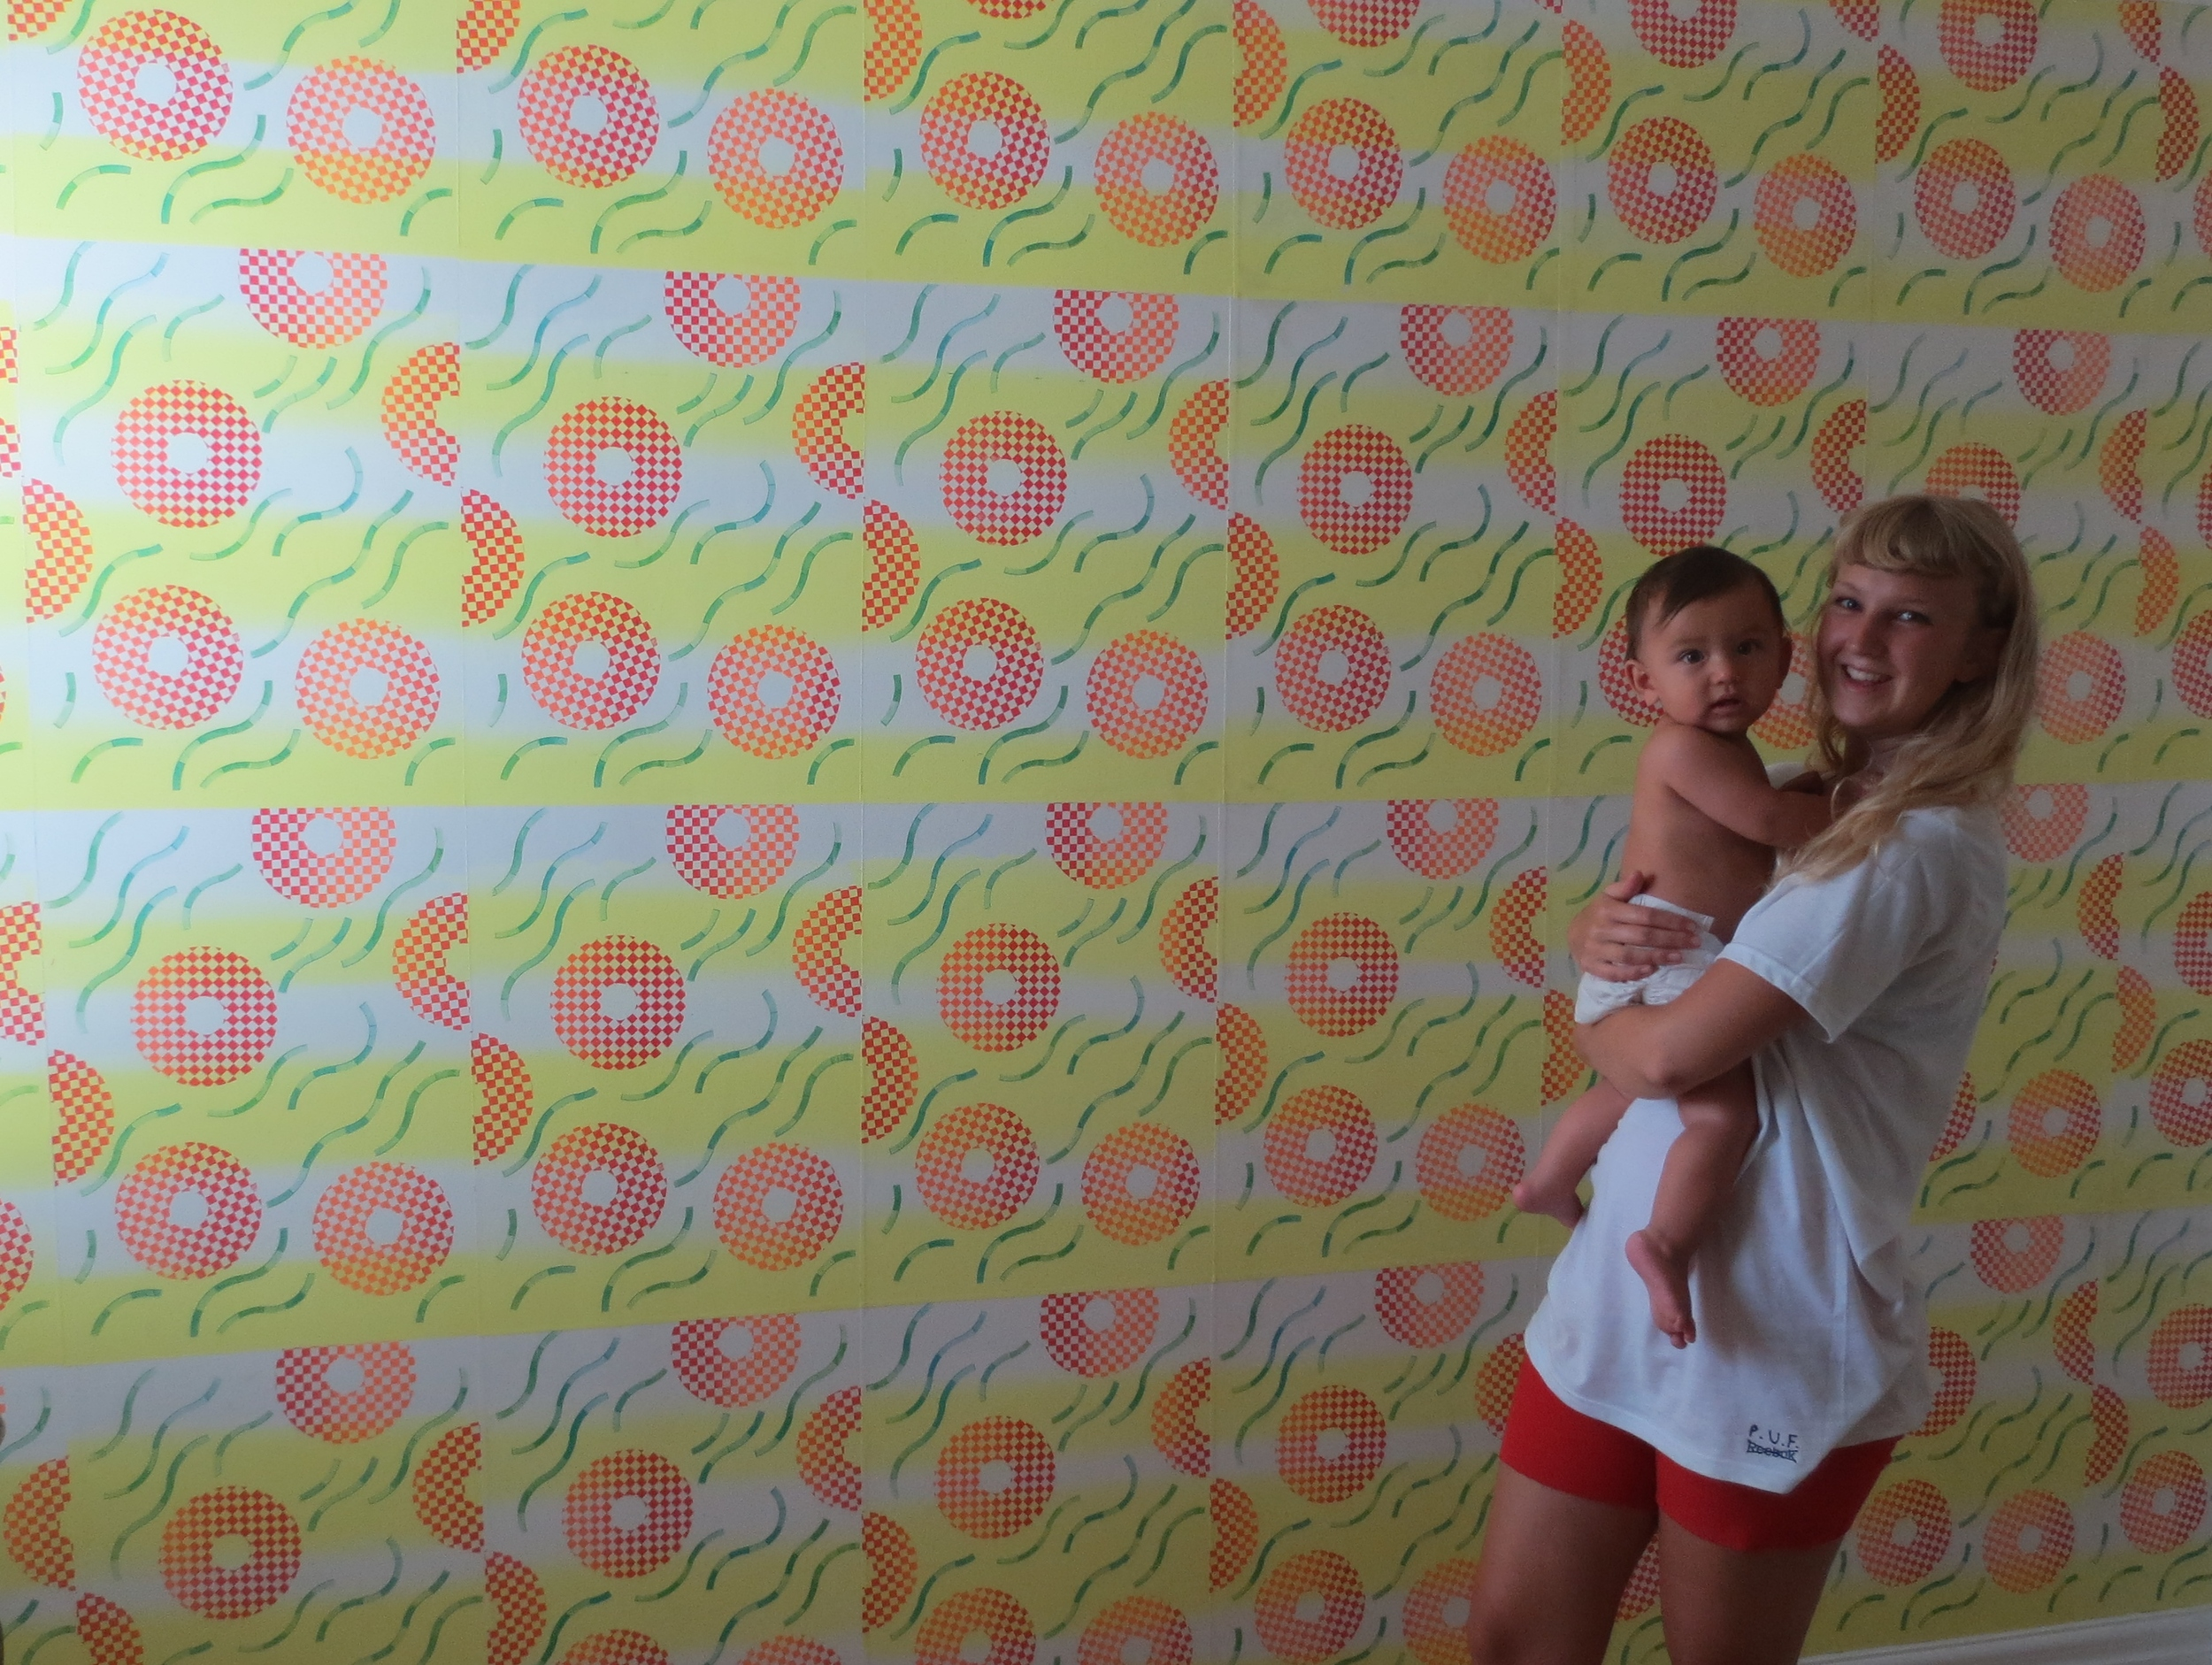 Mr. Baby wallpaper for Eliot  Screenprinted wallpaper wall in bedroom  2013 (permanent installation)